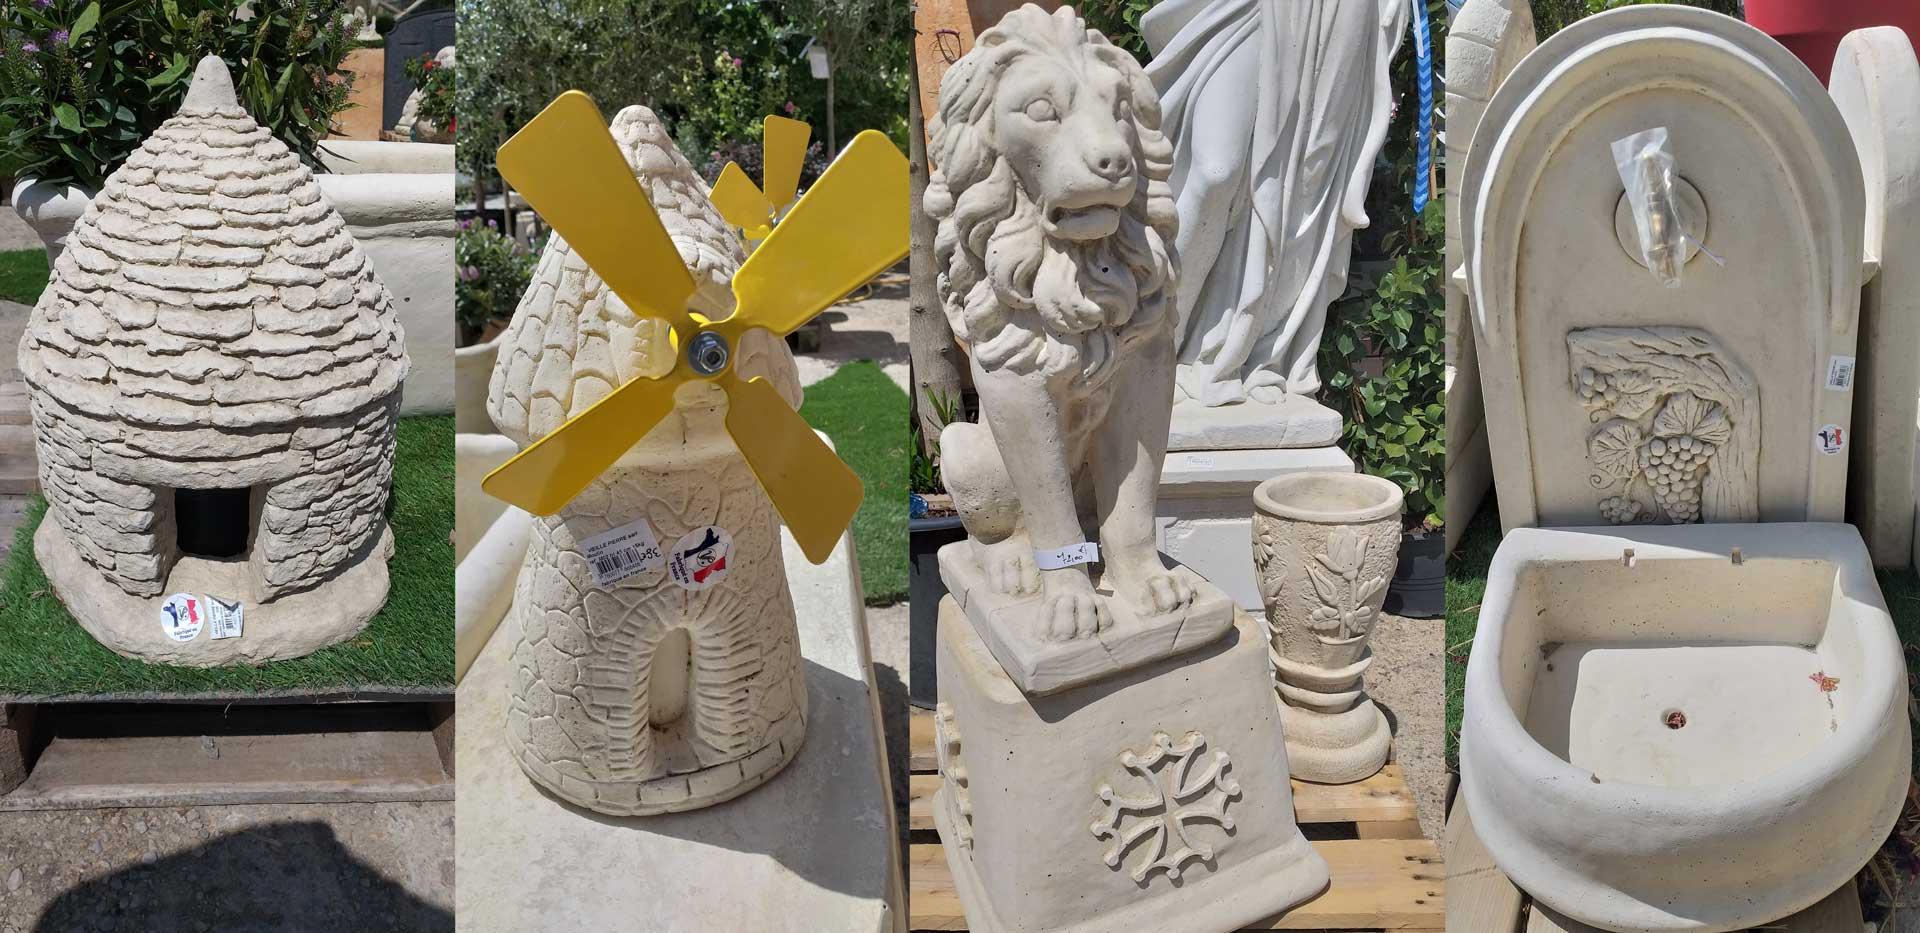 poterie-fabriquee-en-france---pepiniere-arcadie-lezignan-corbieres